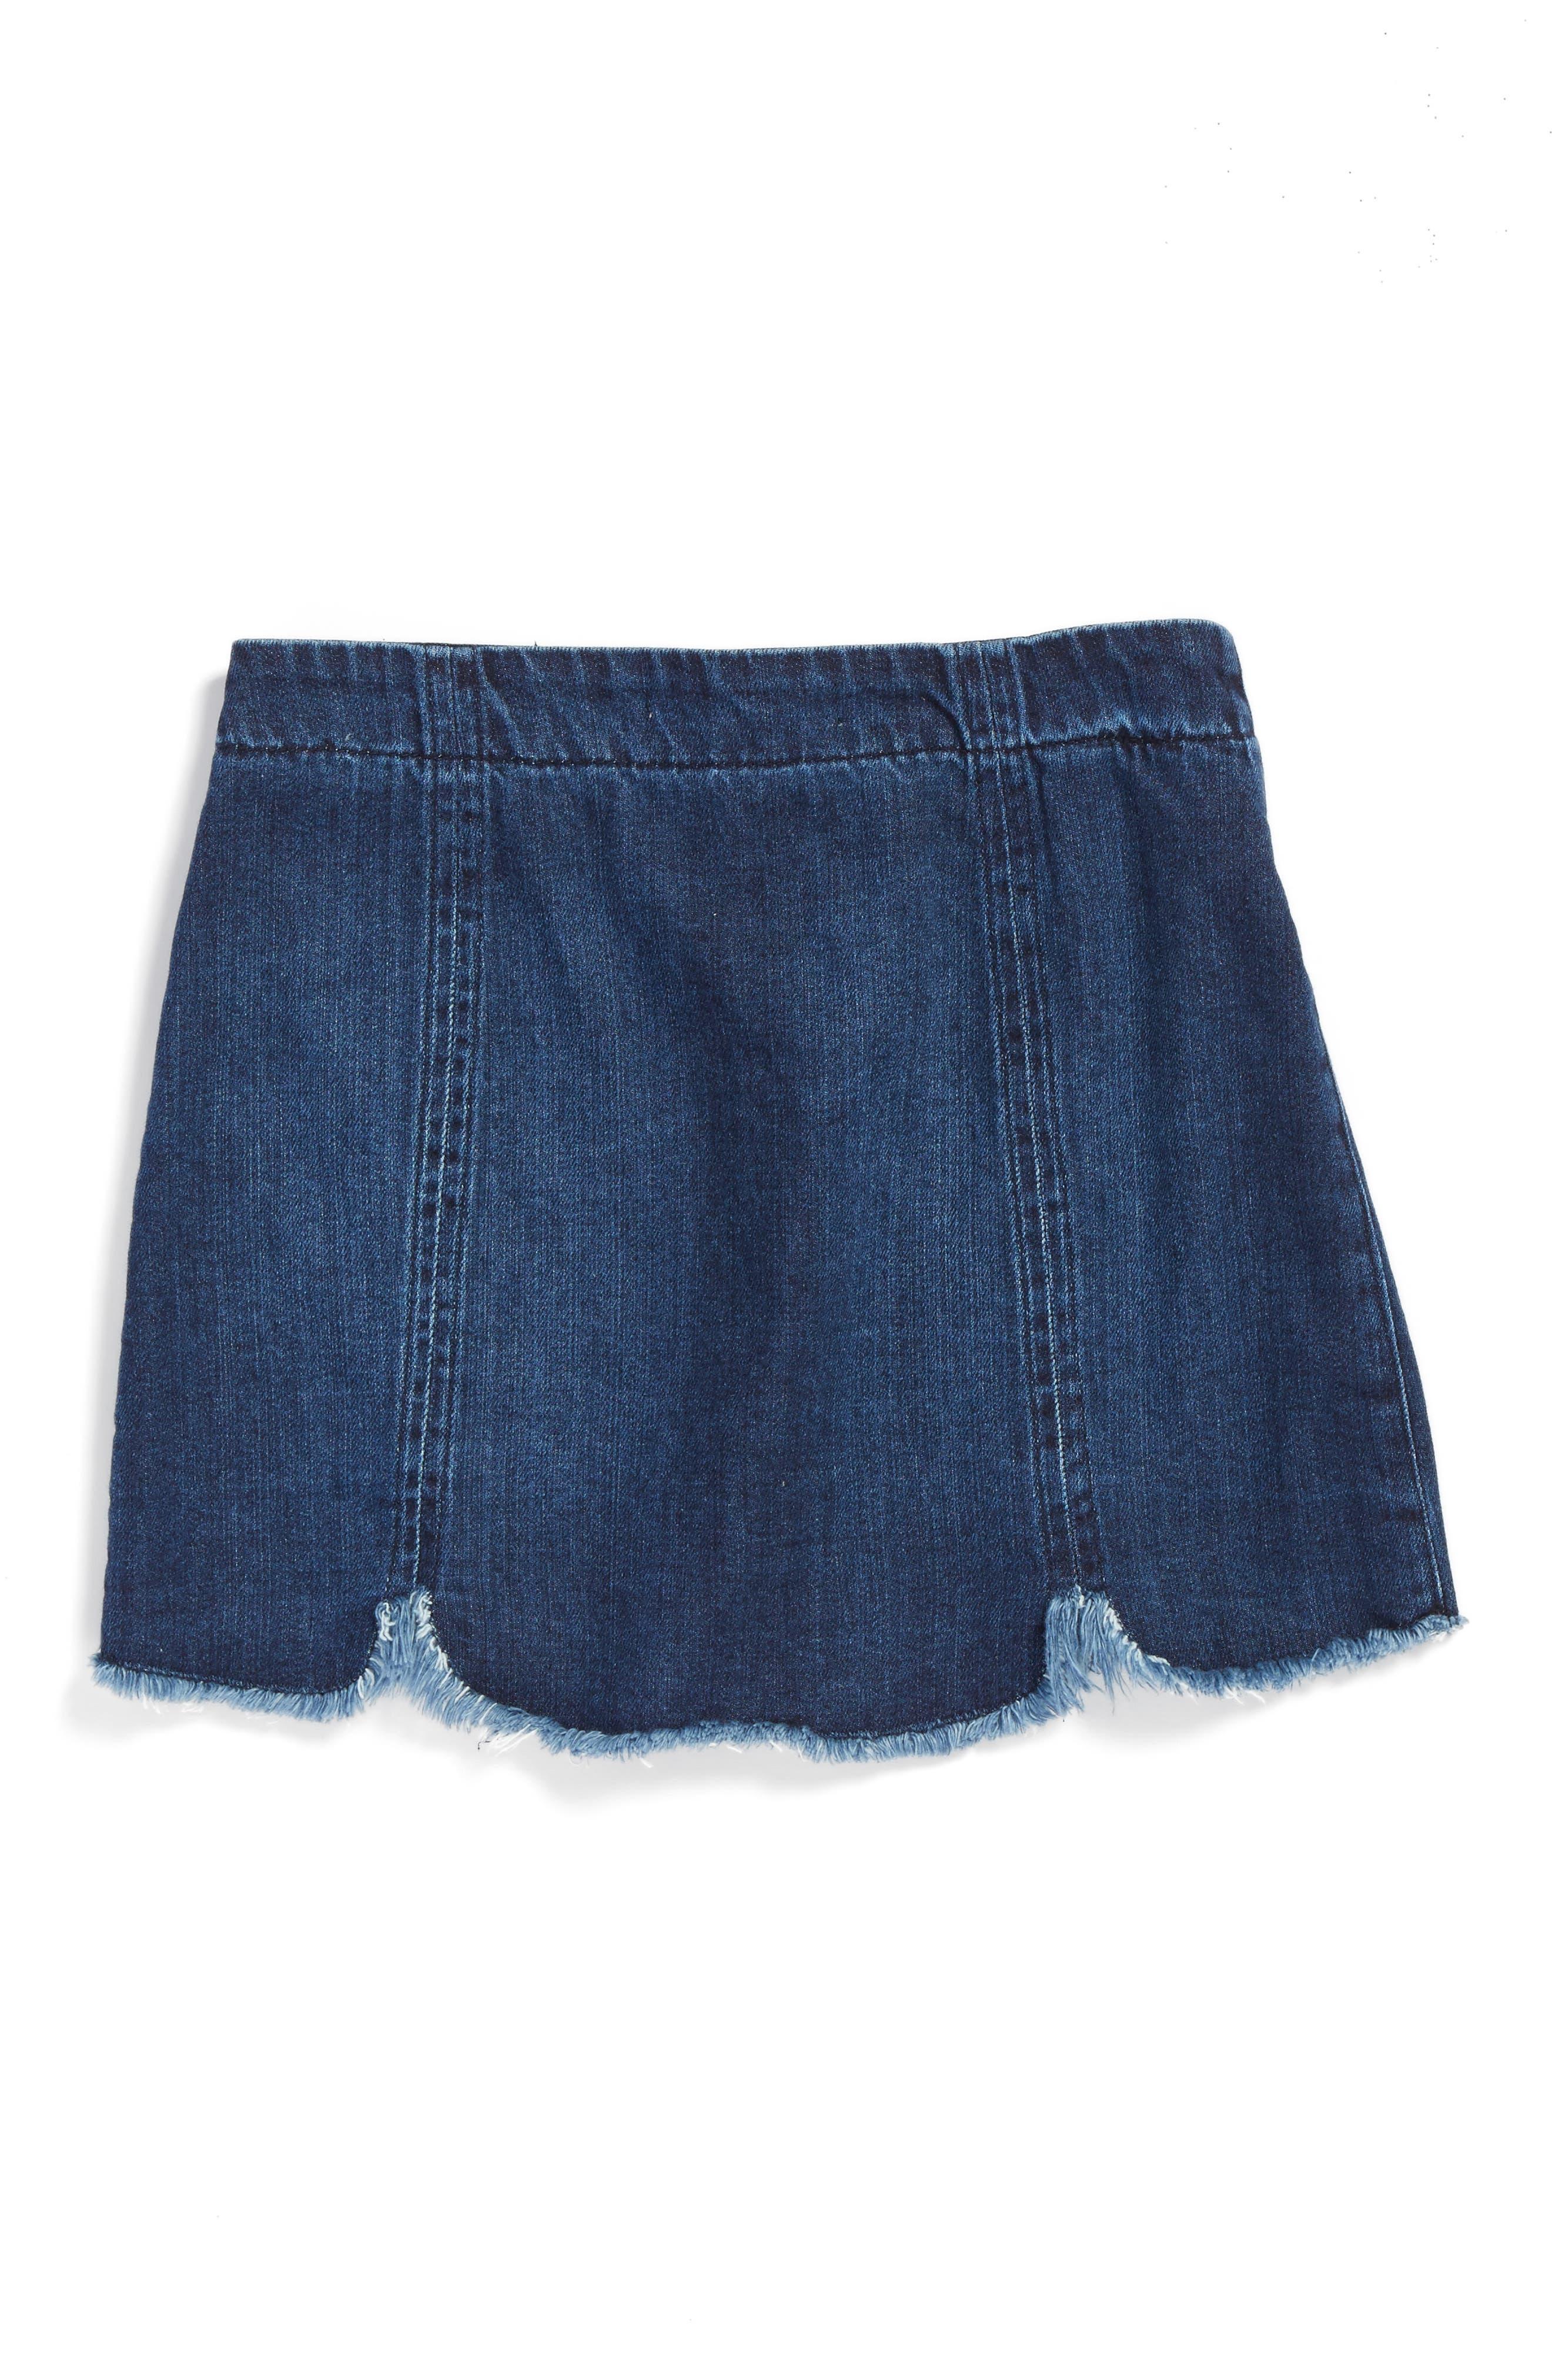 Frayed Scallop Denim Skirt,                             Alternate thumbnail 2, color,                             Indigo